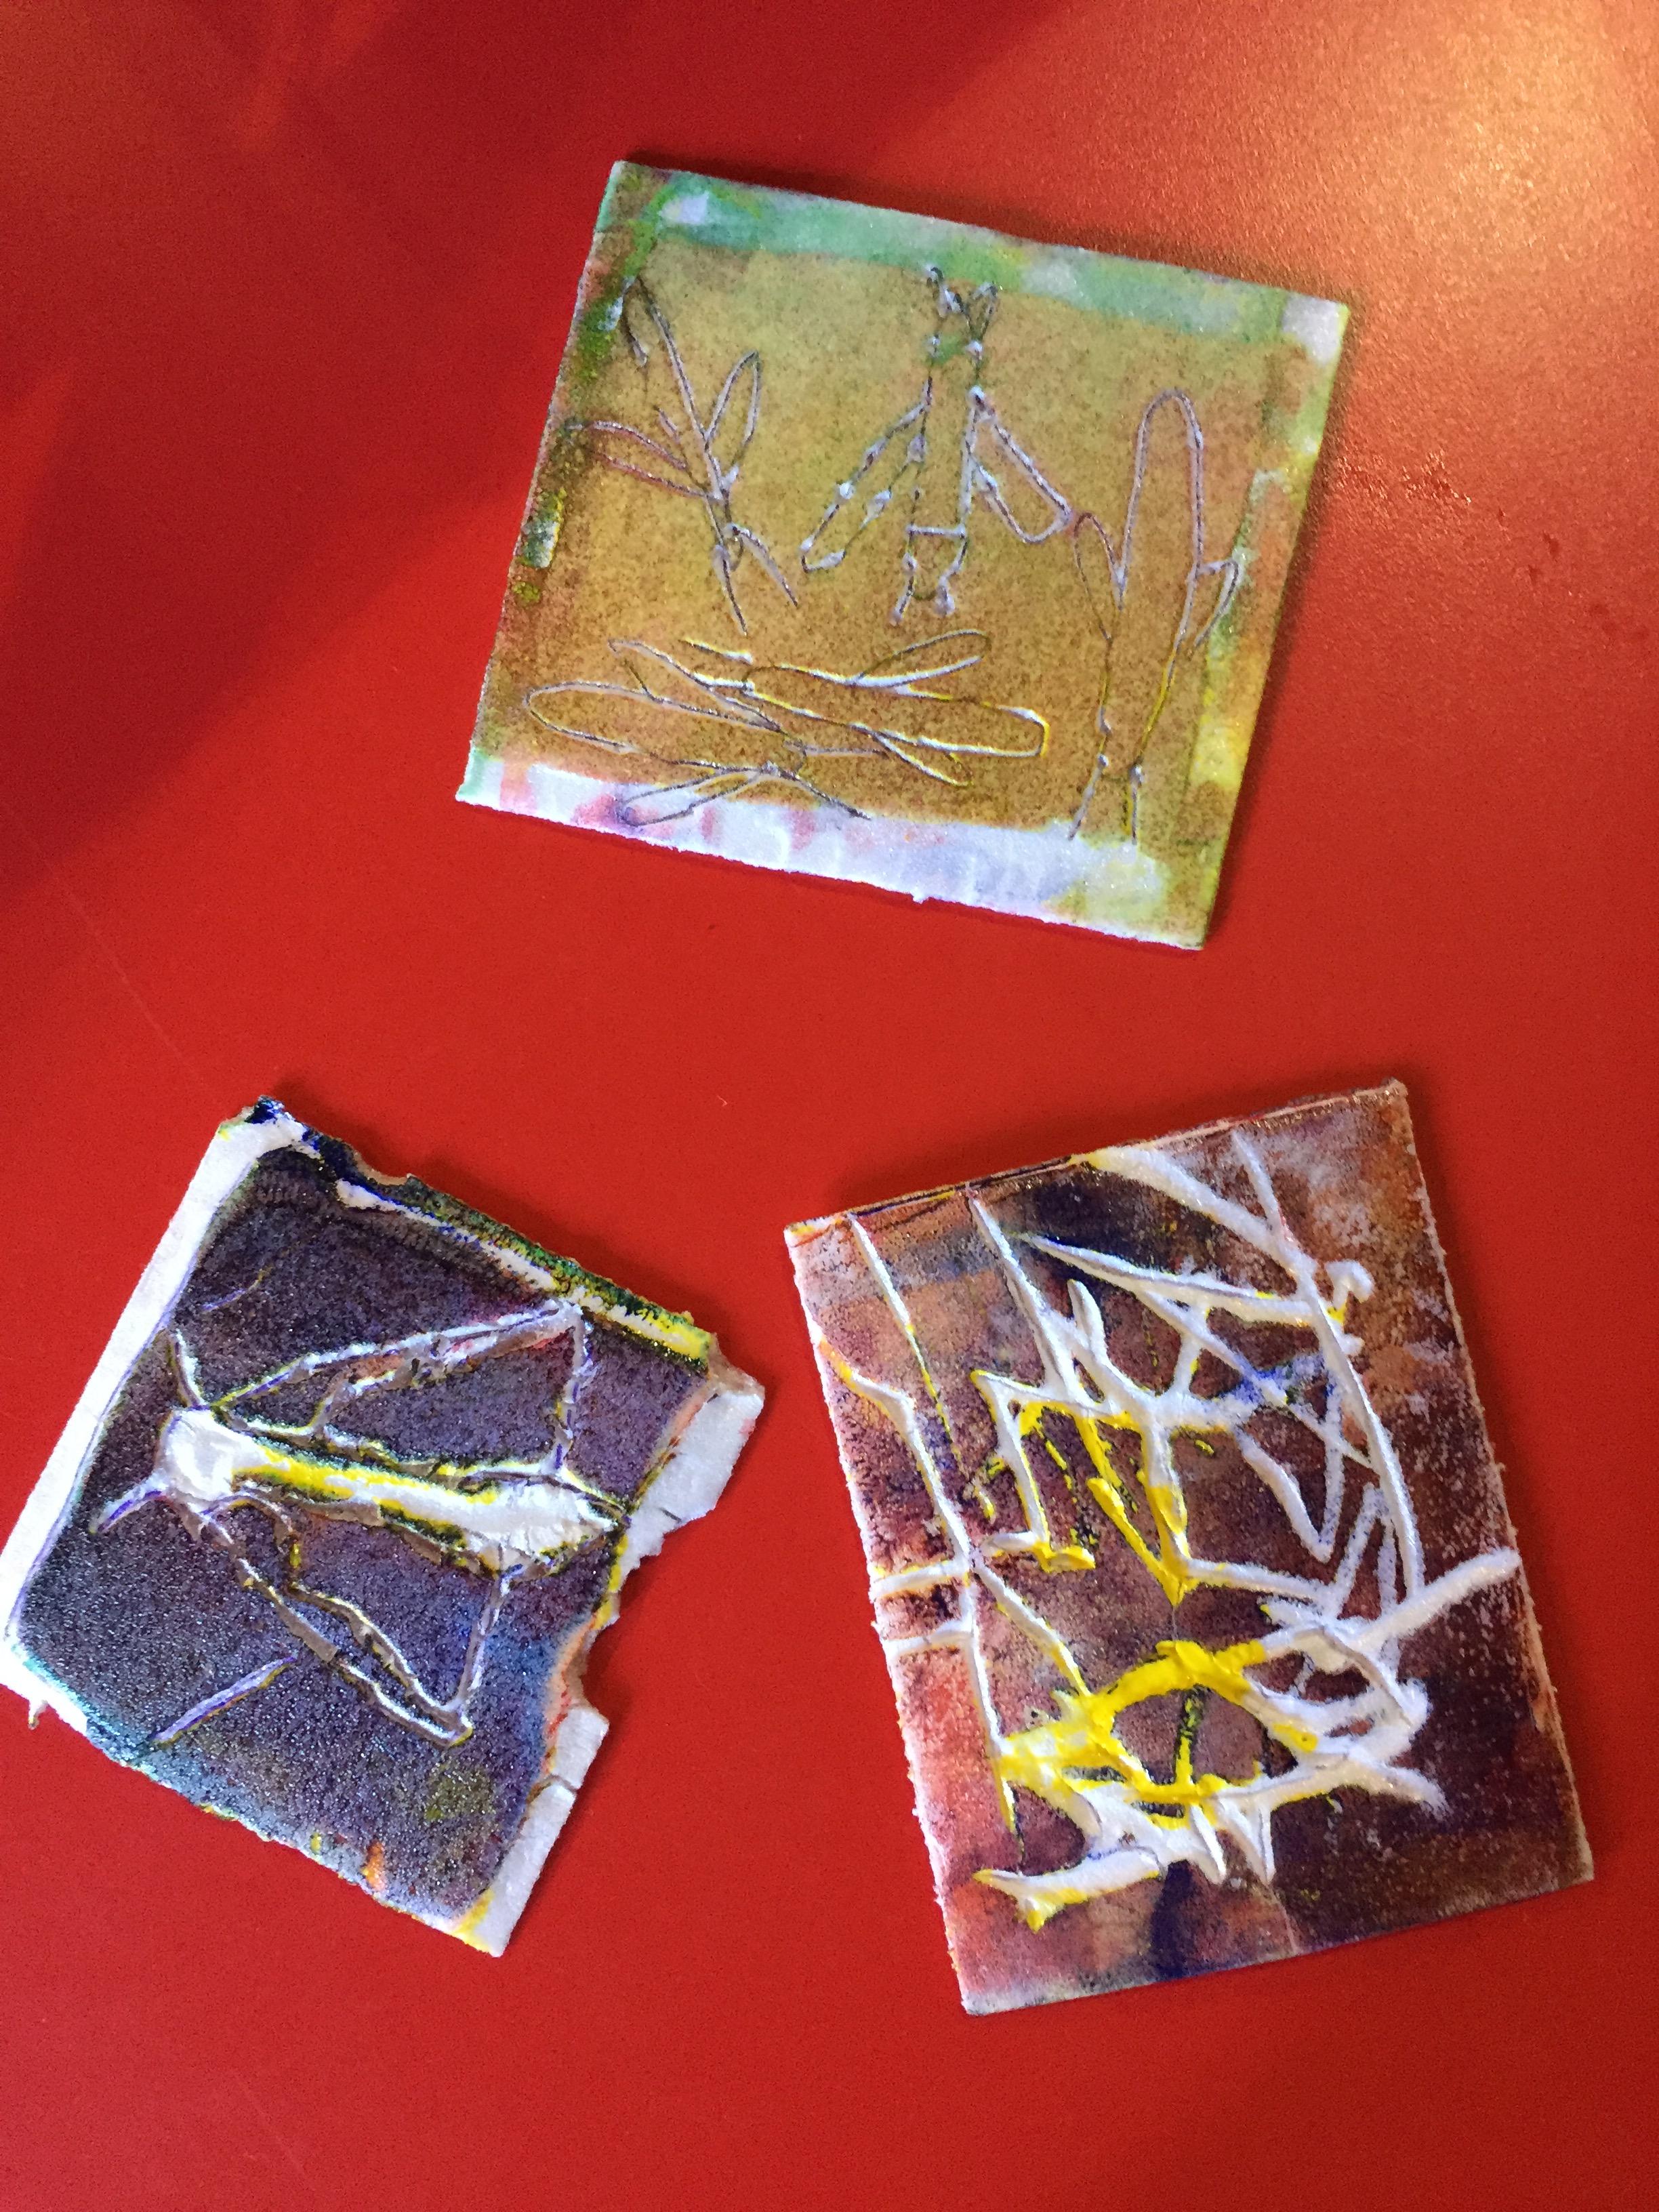 Photo of plates made in a print workshop run by Skirrid Print Studio at the Hub in Peterchurch - printing designs of moths